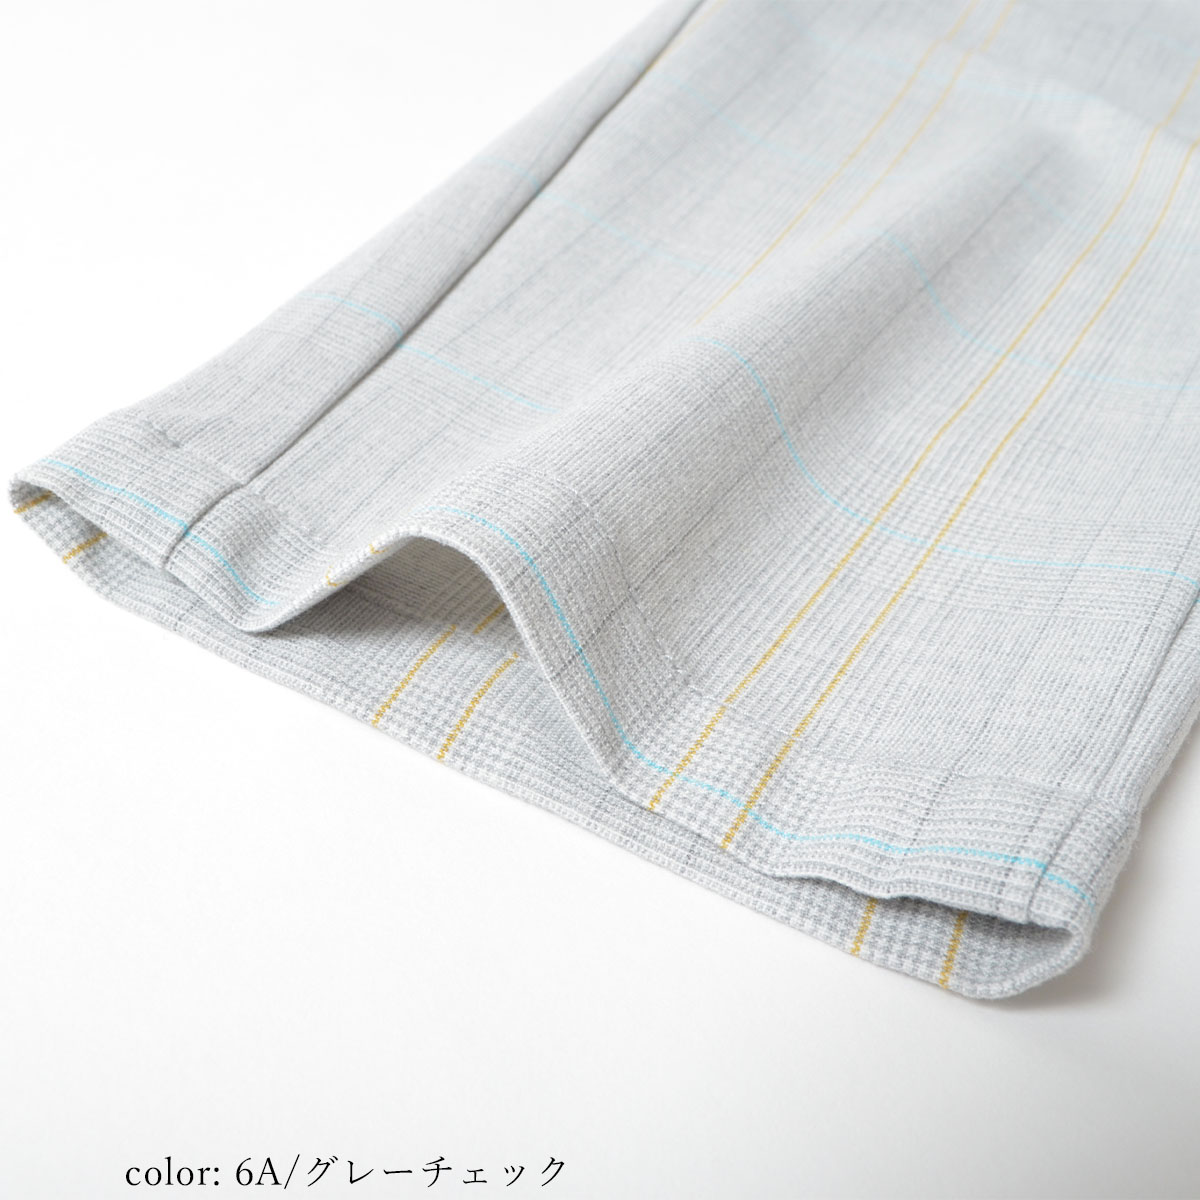 【2BUY15%OFF】リラックステーパード GM3078